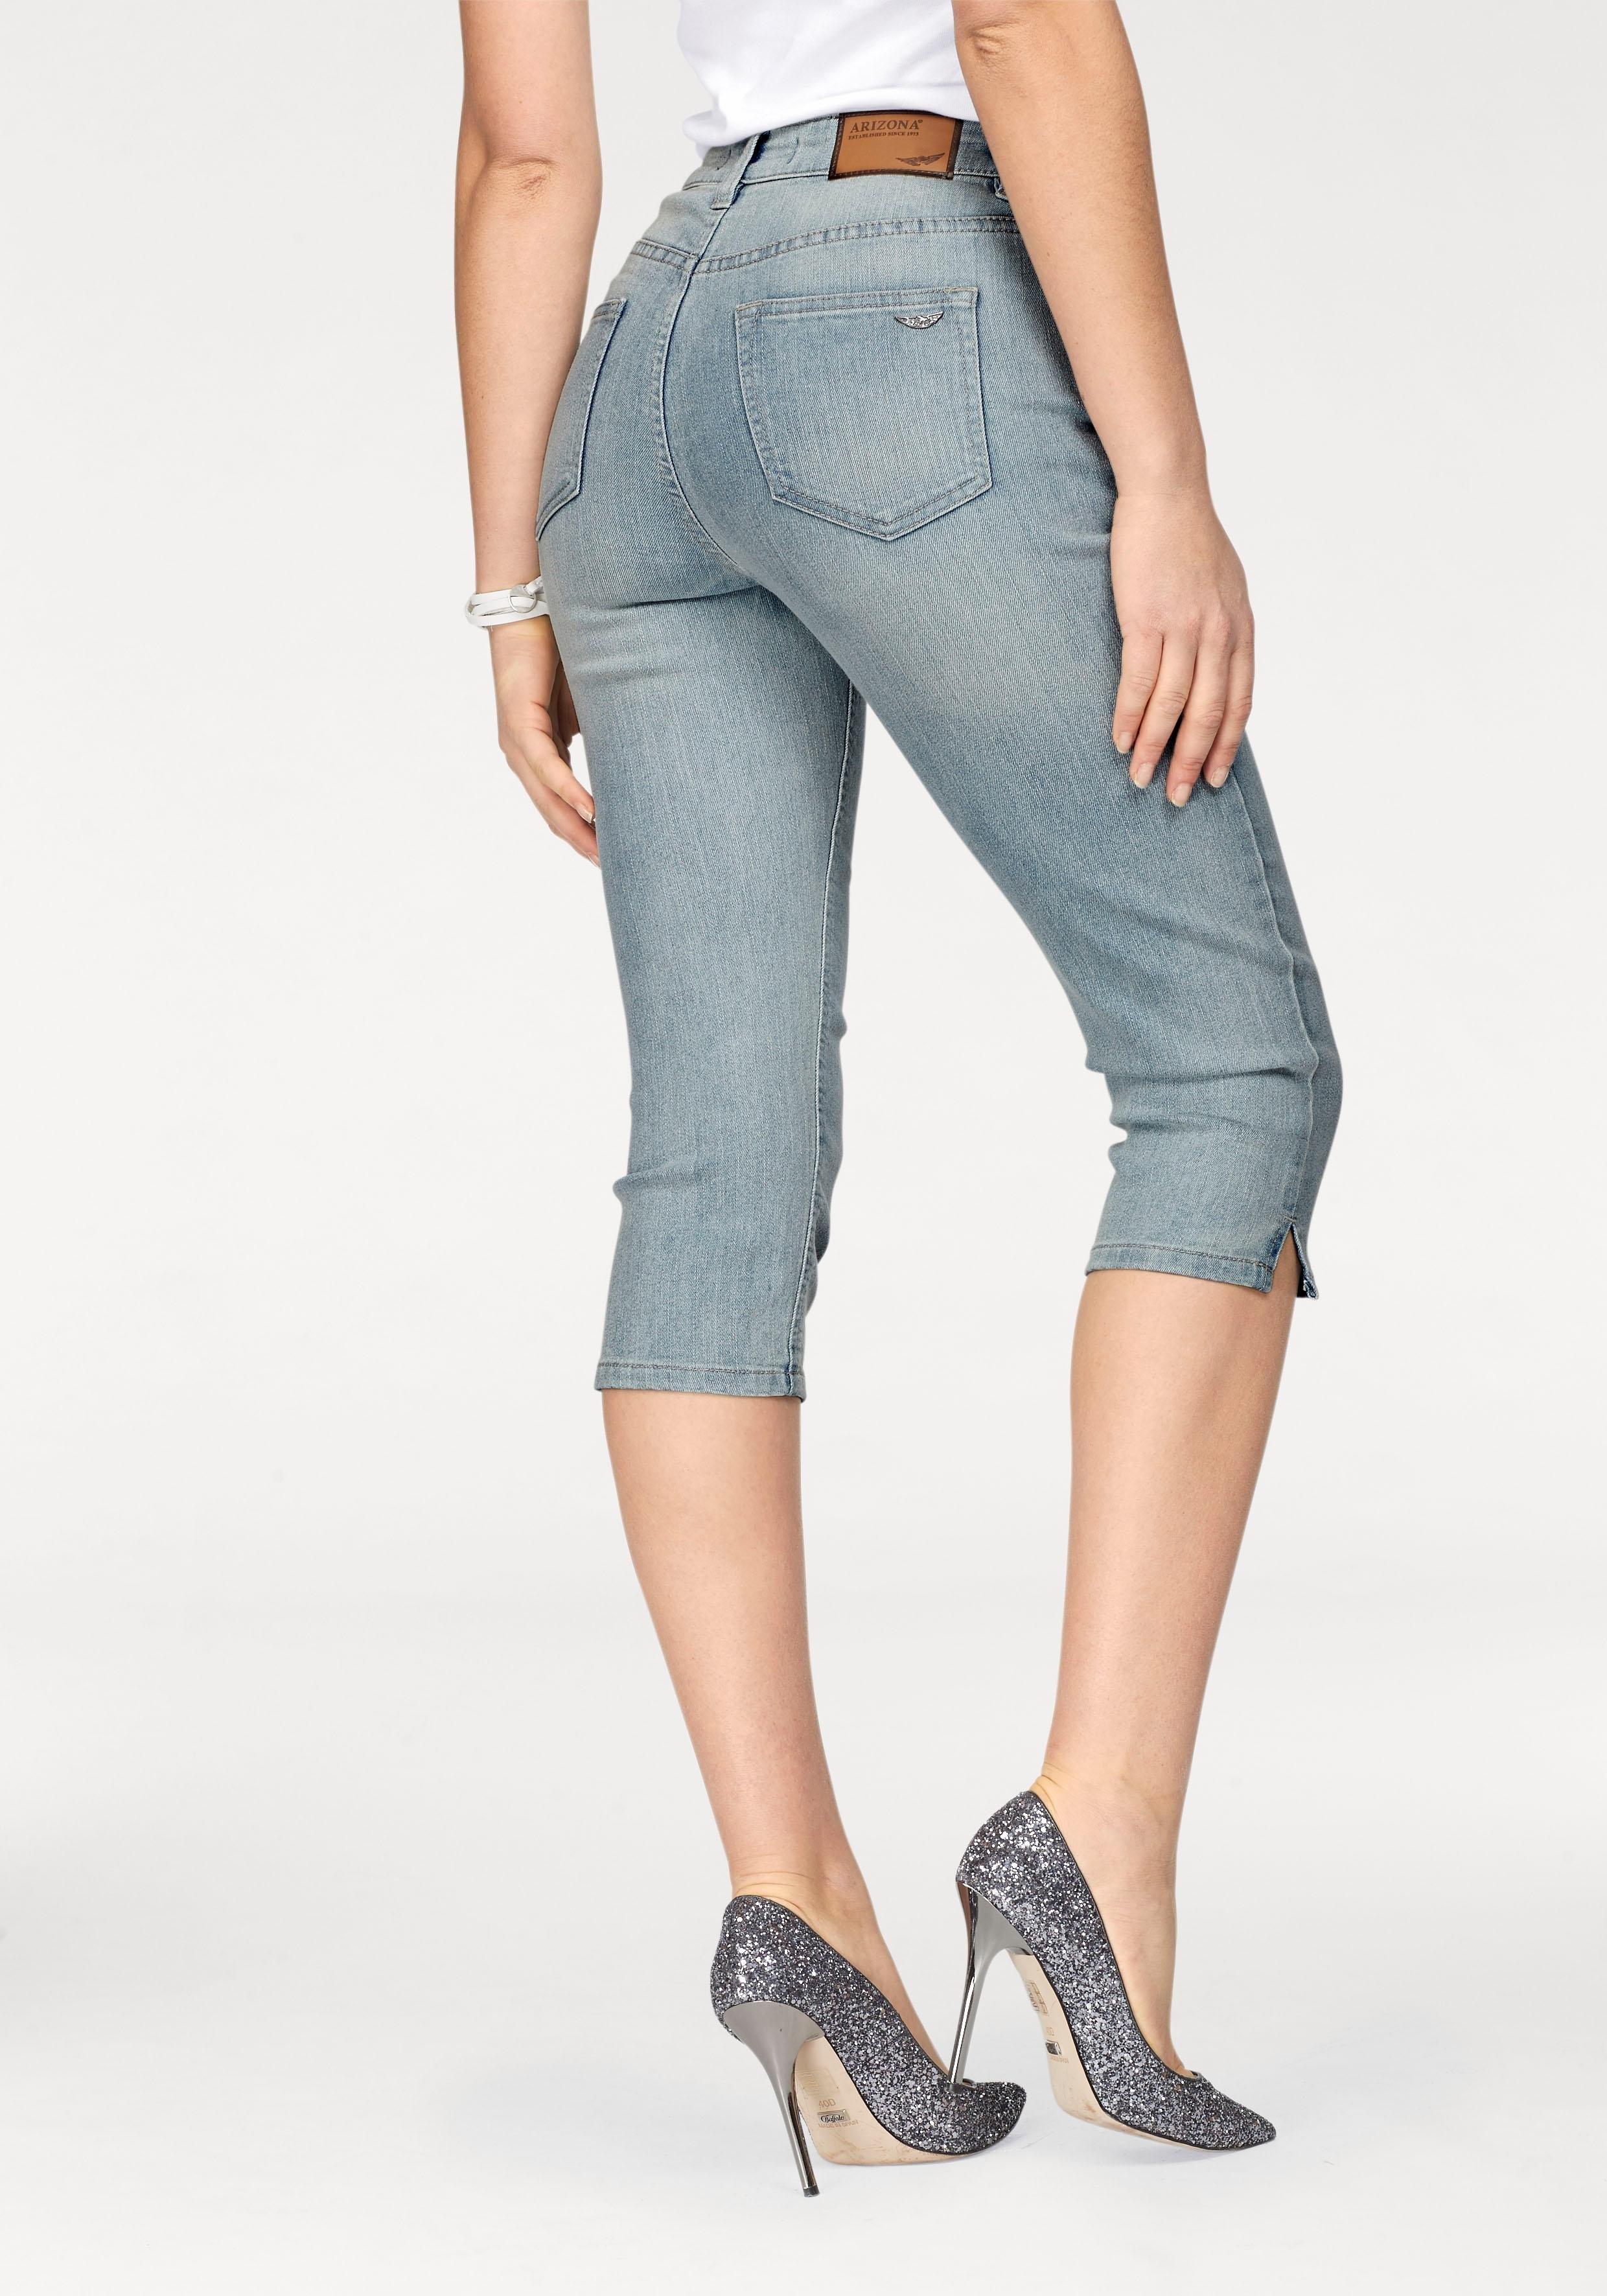 Arizona capri-jeans - verschillende betaalmethodes